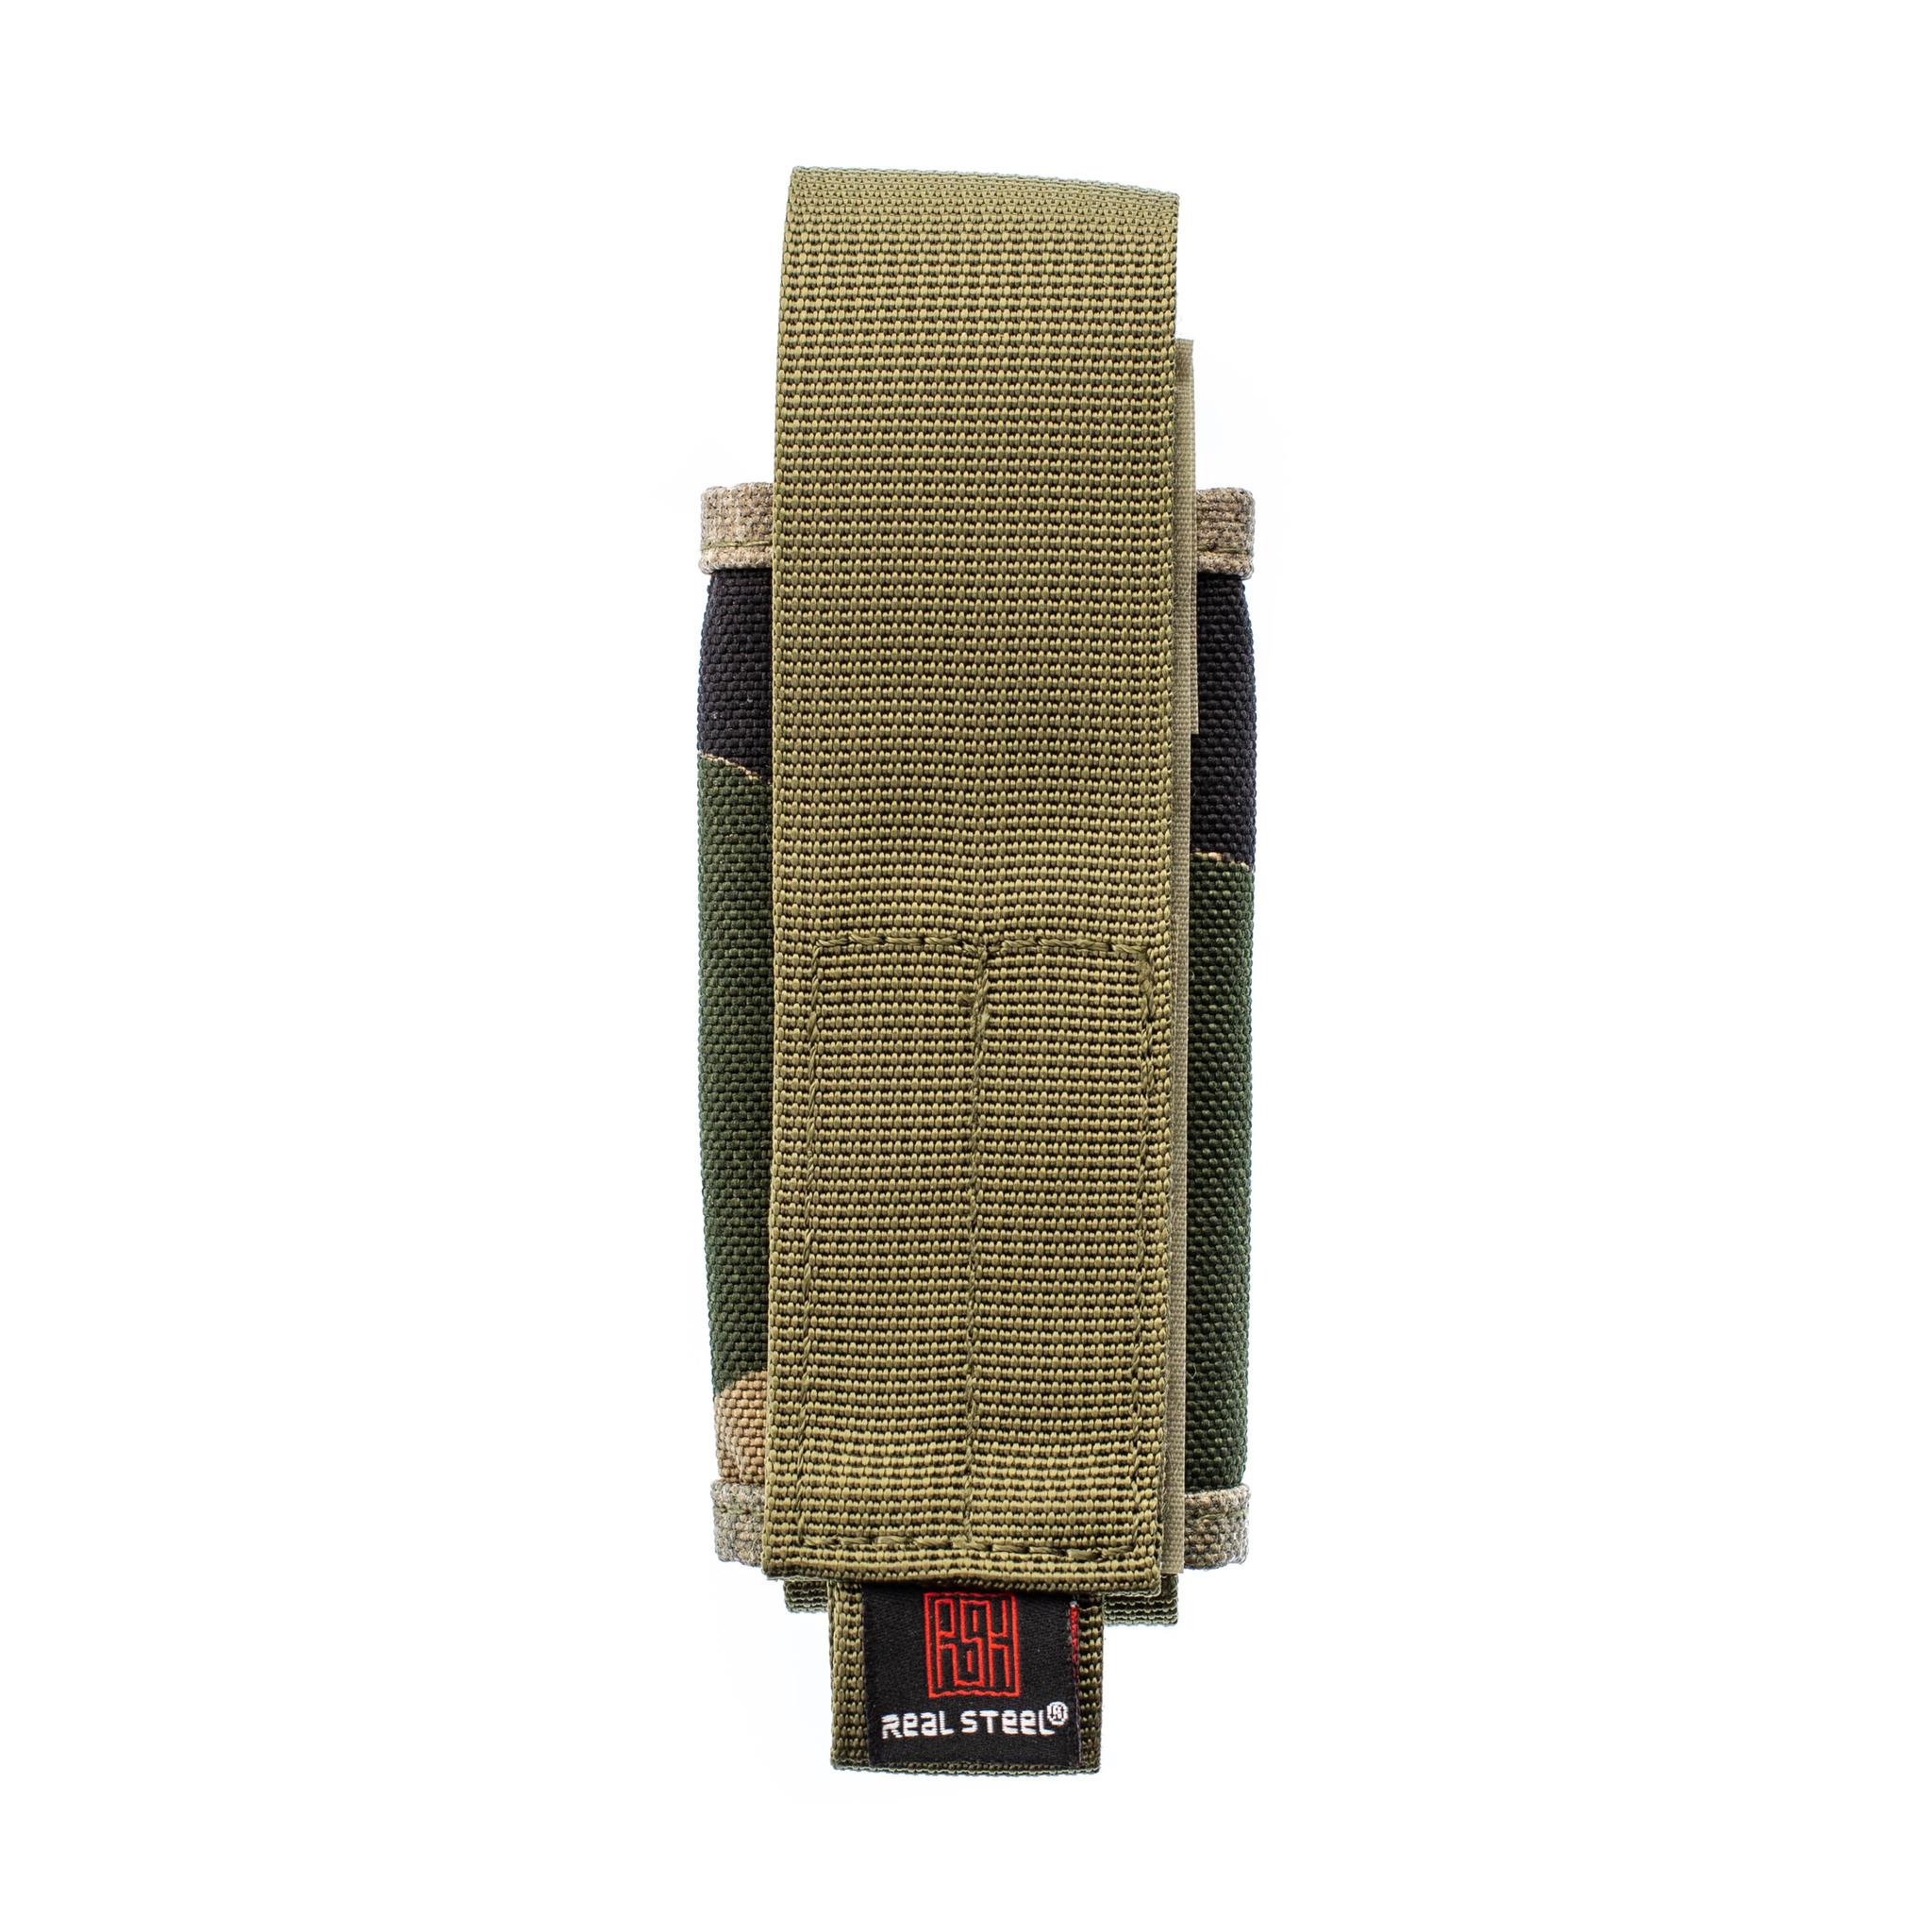 Чехол для ножей Real Steel Camo, 127 мм от Realsteel